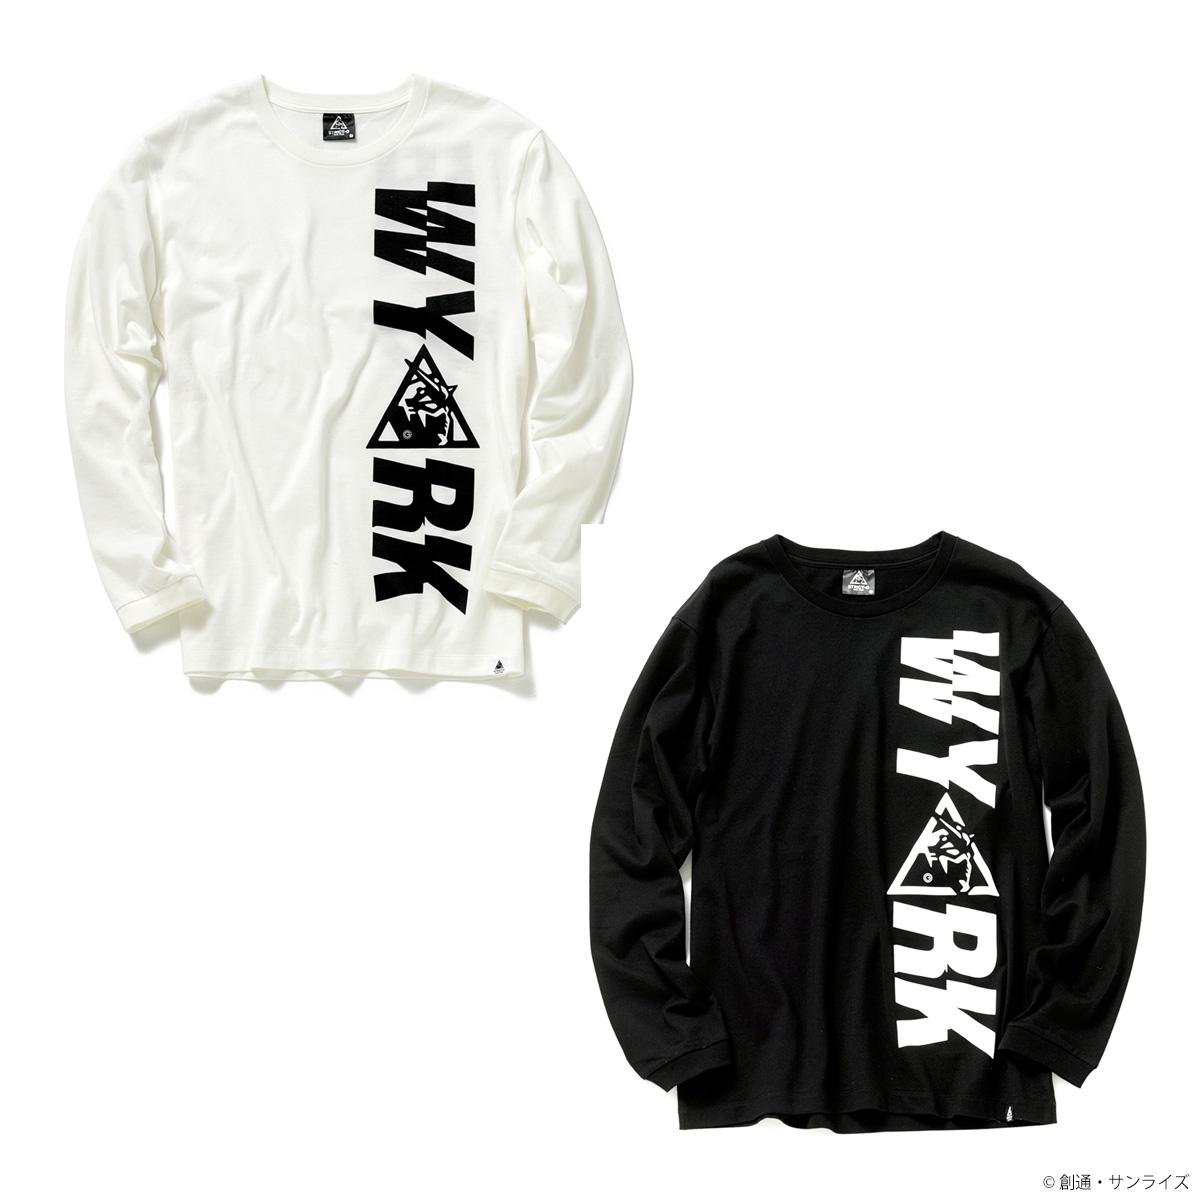 STRICT-G NEW YARK 長袖Tシャツ NYロゴ柄